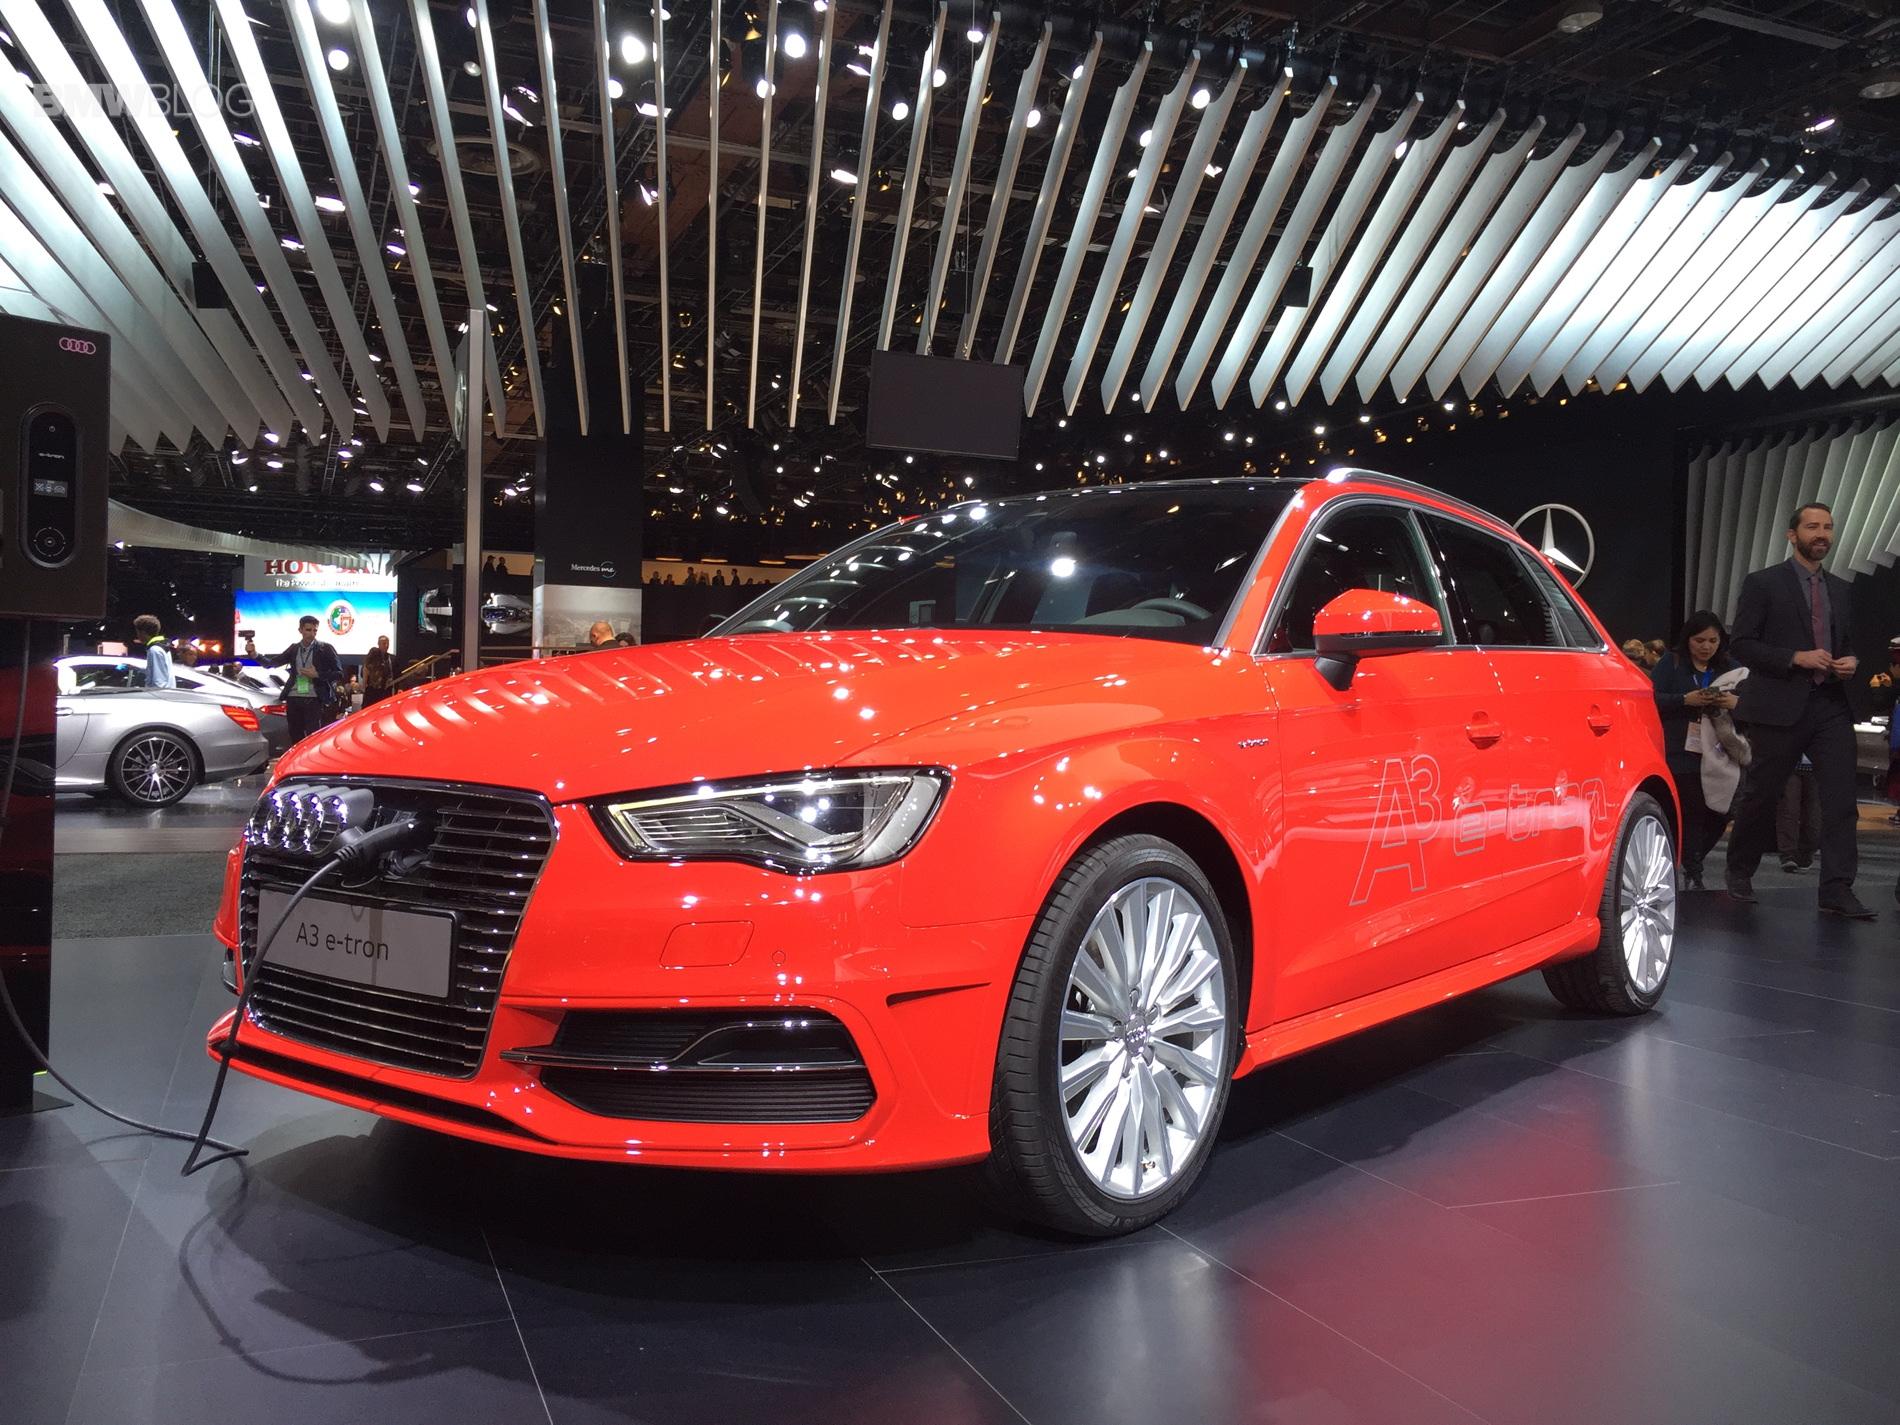 Audi E-Tron Backgrounds on Wallpapers Vista